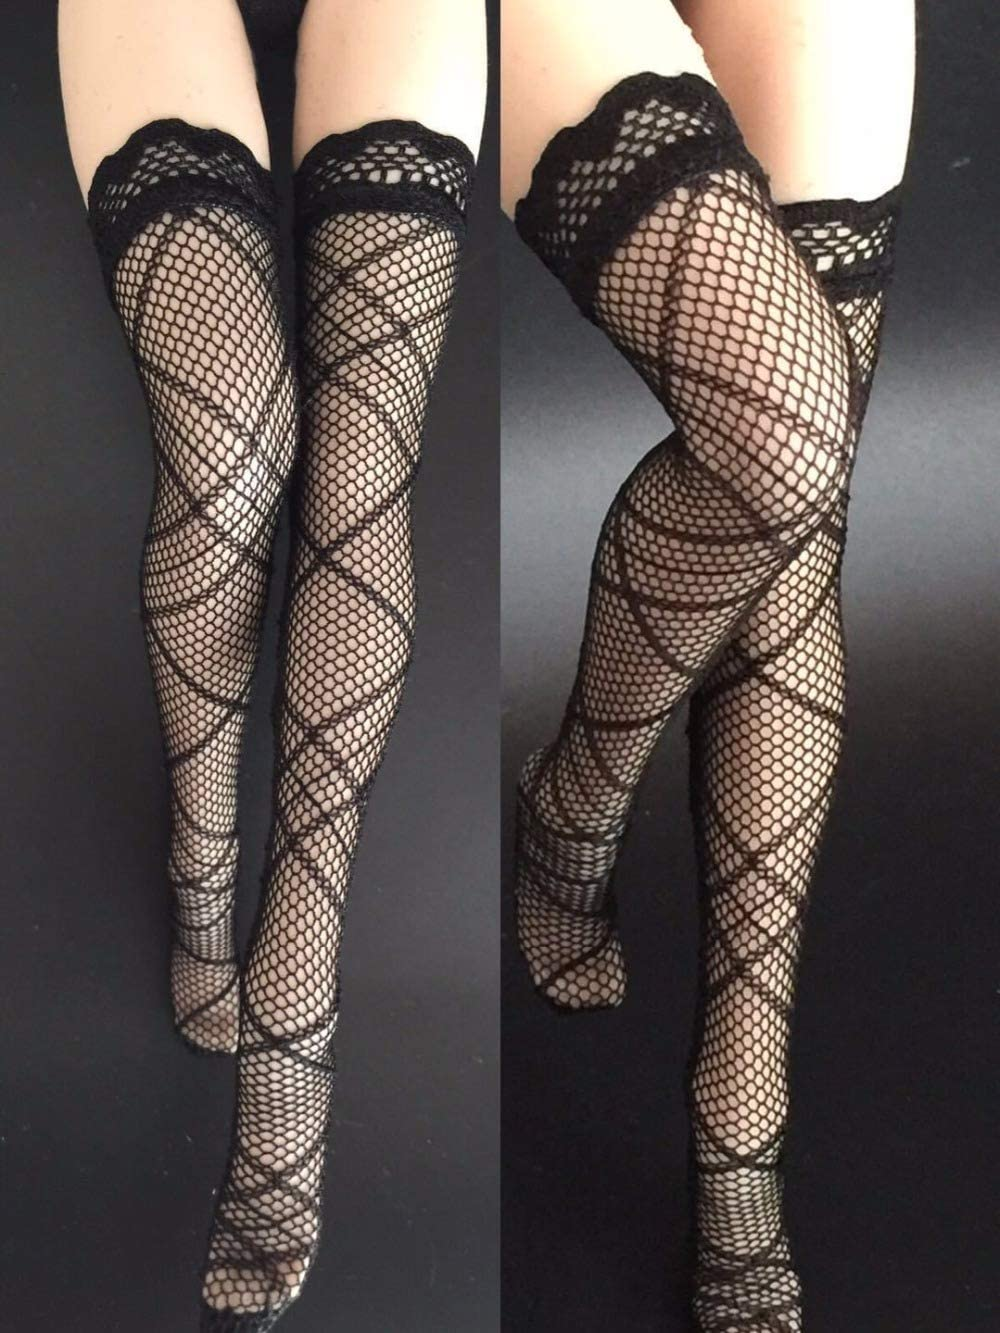 1//6 Scale Black Fishnet Socks Pantyhose Hosiery For 12'' Female Action Figure